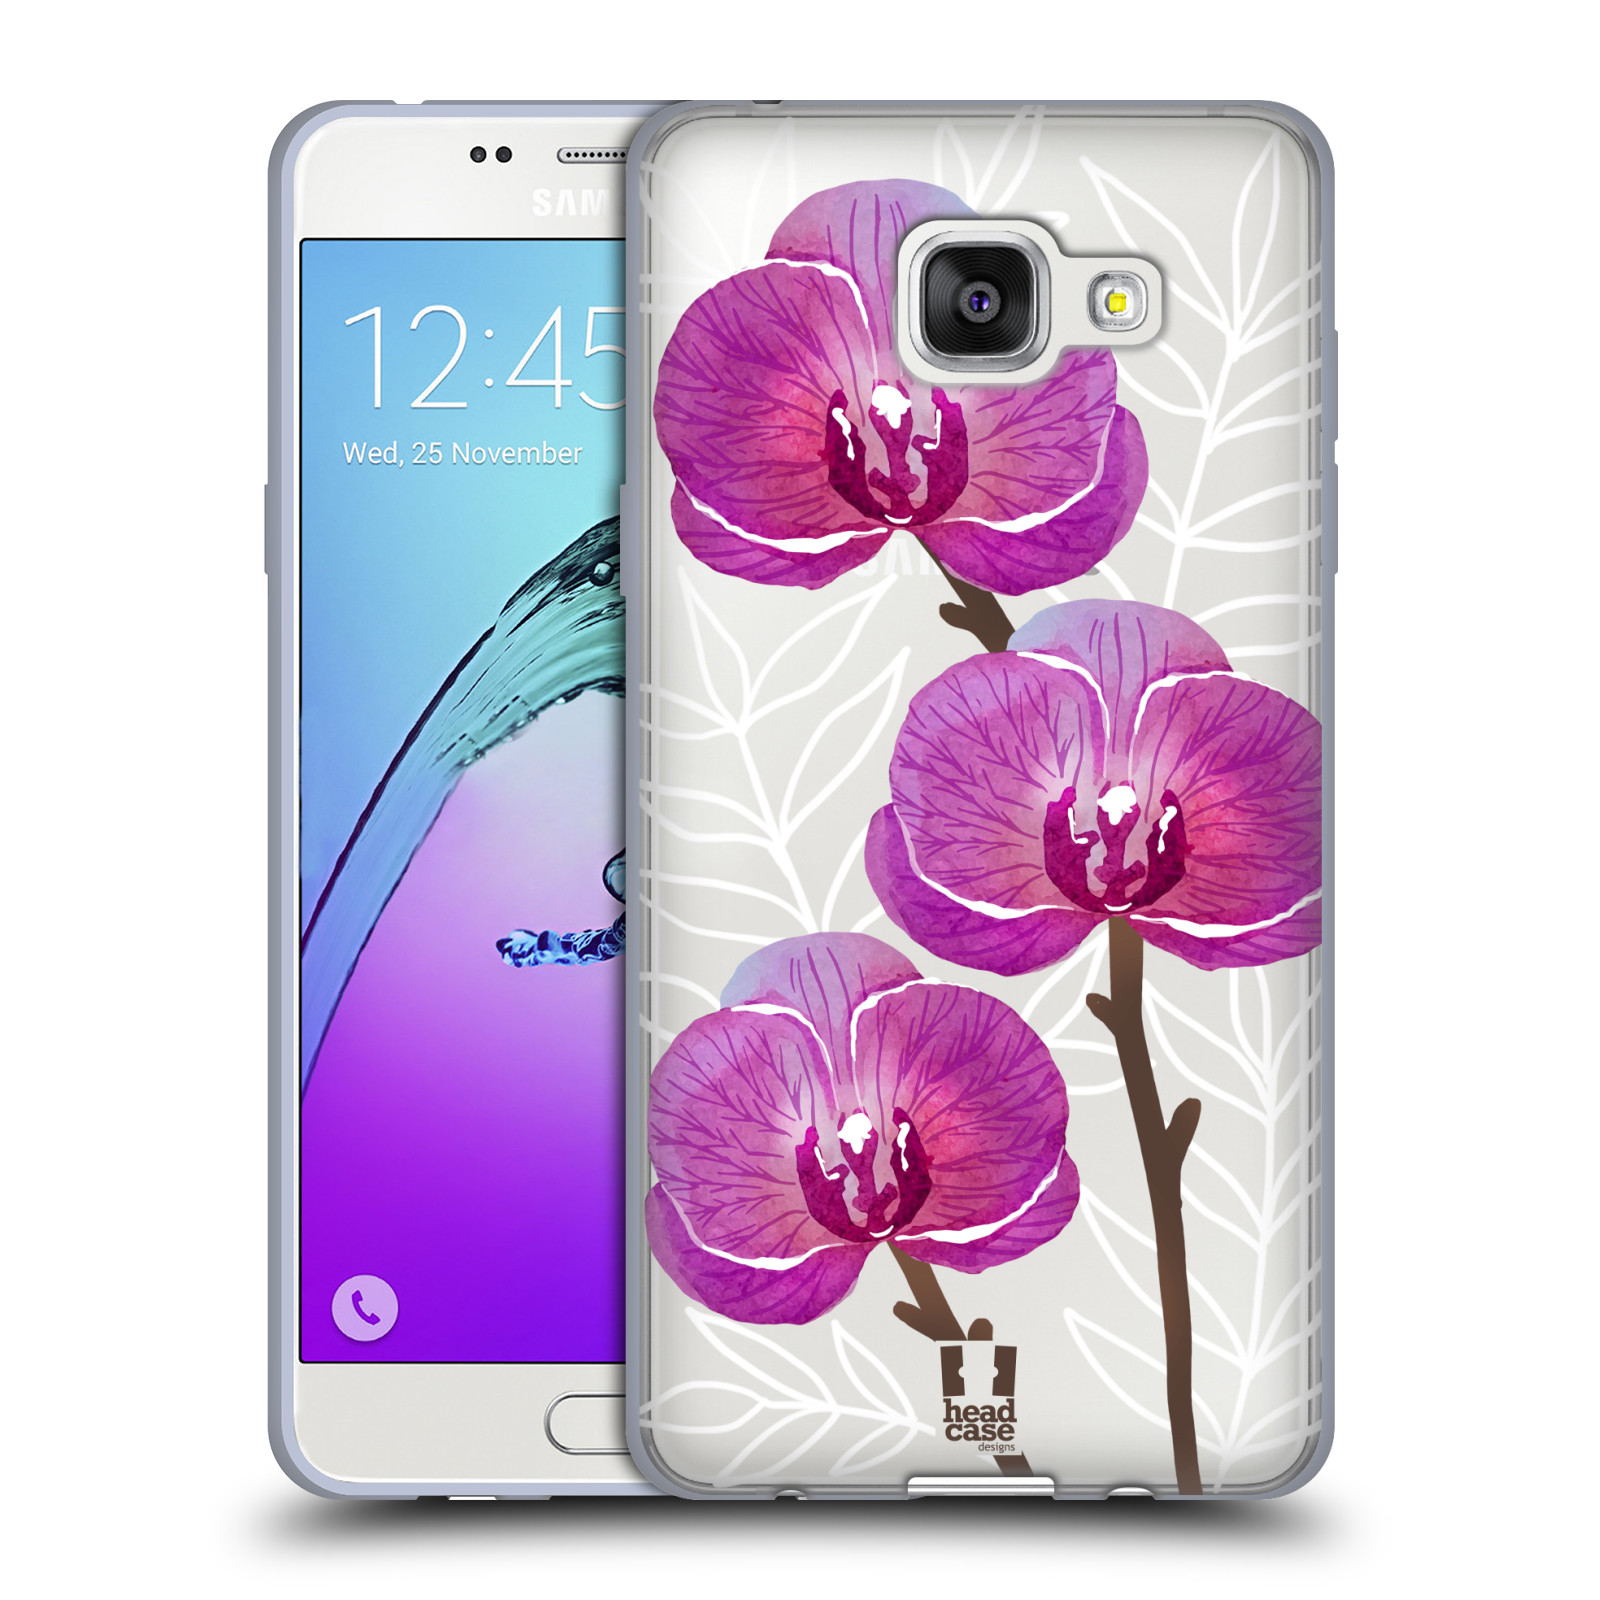 Silikonové pouzdro na mobil Samsung Galaxy A5 (2016) - Head Case - Hezoučké kvítky - průhledné